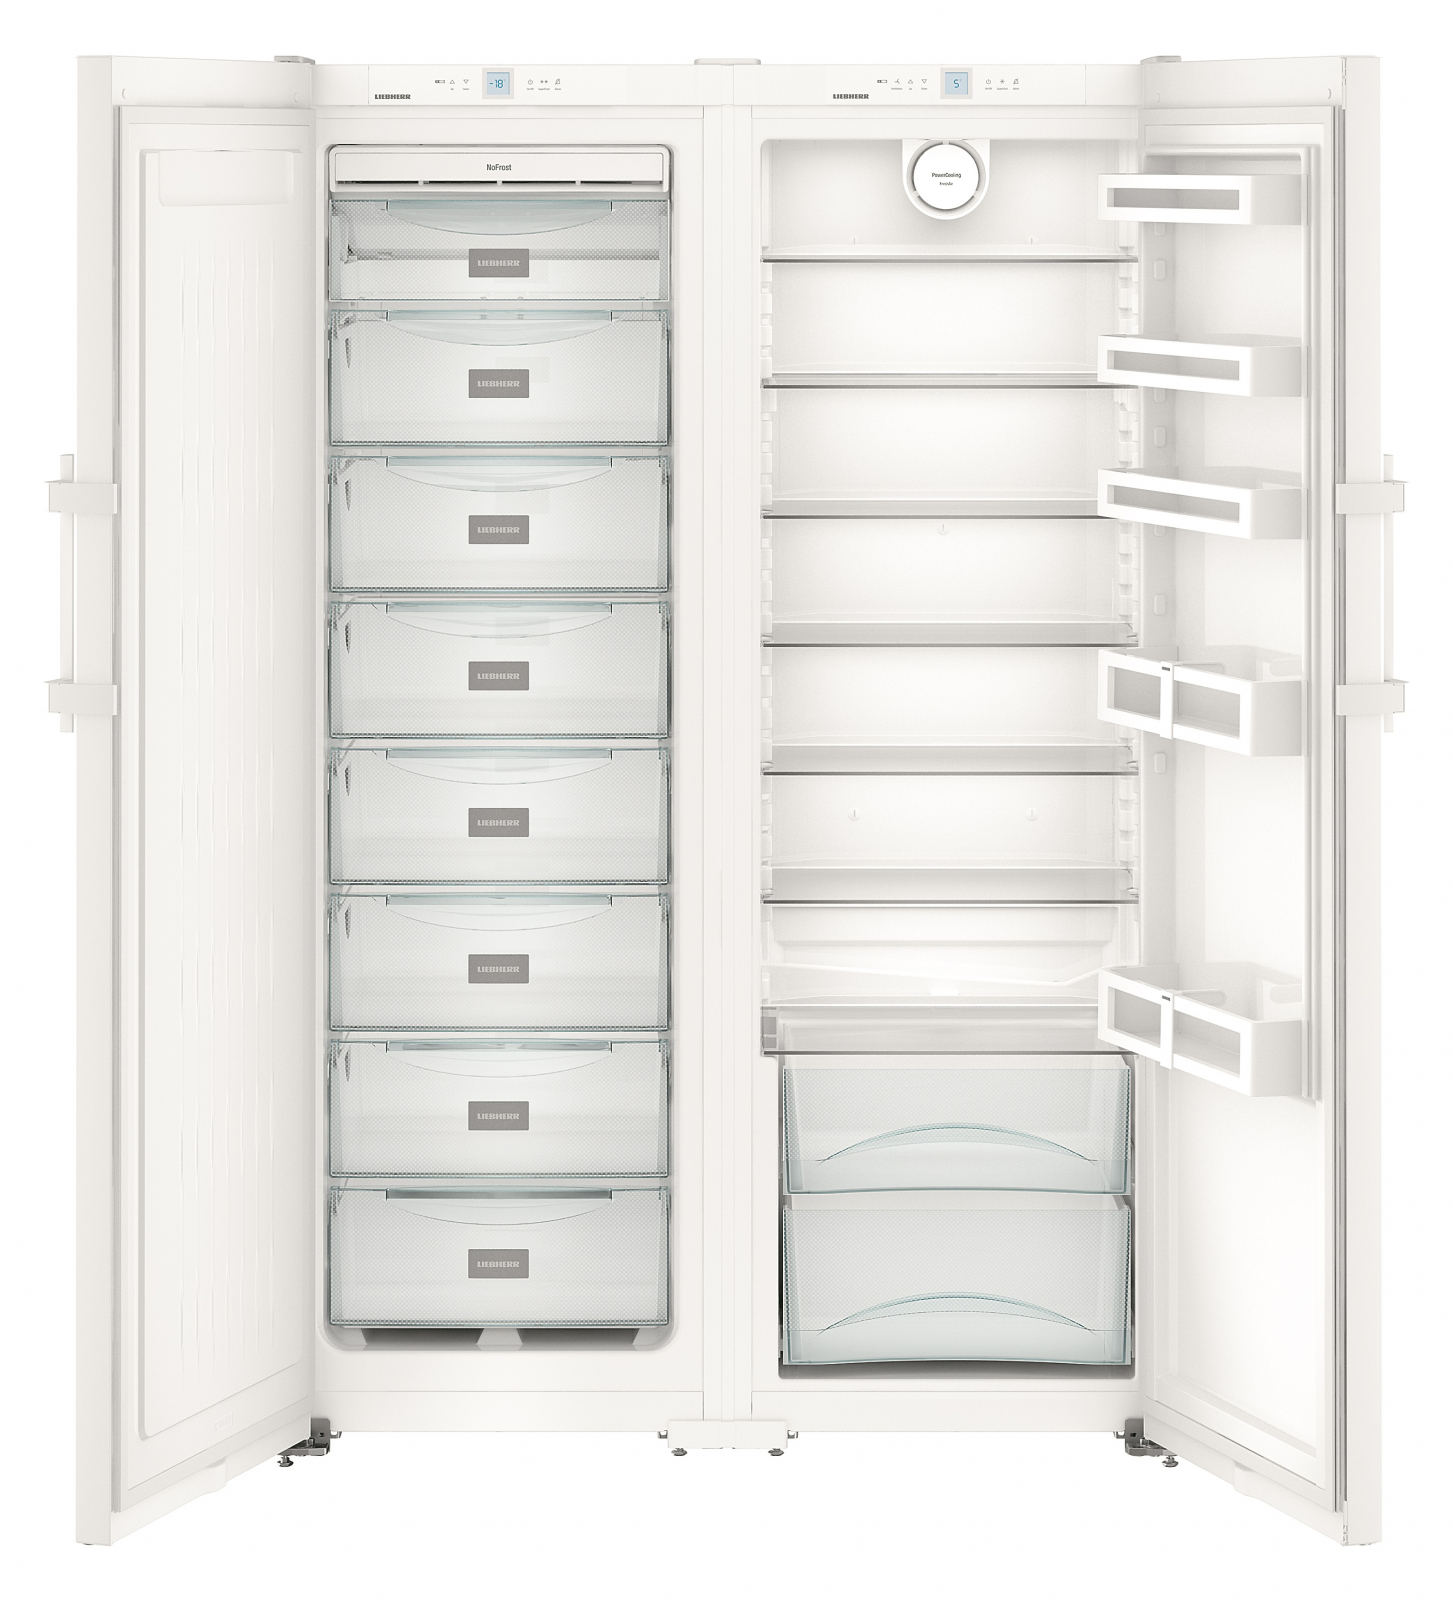 купить Side-by-side холодильник Liebherr SBS 7242 Украина фото 3